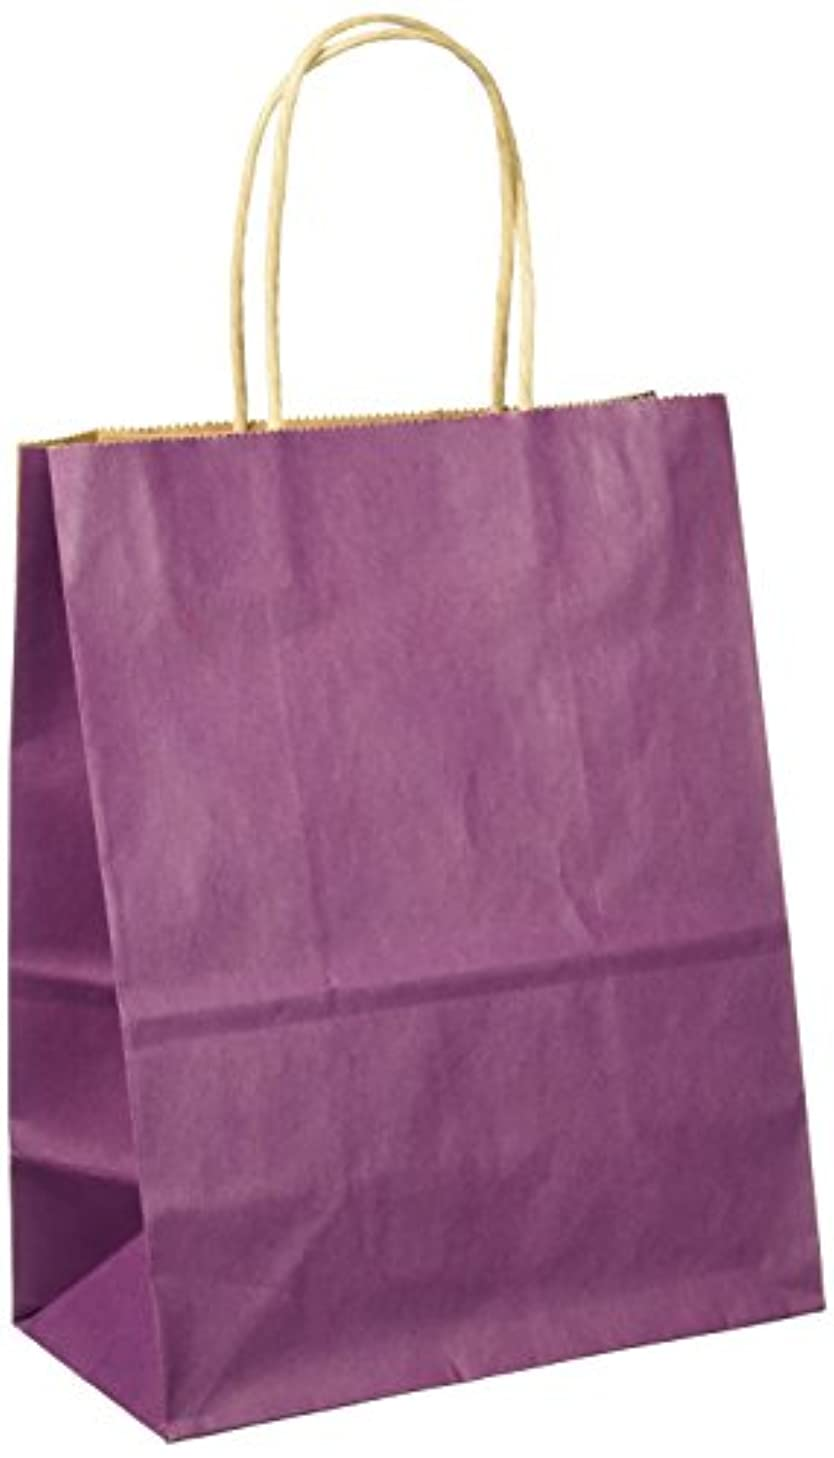 Cindus Kraft Cub Tote Gift Bag, Purple